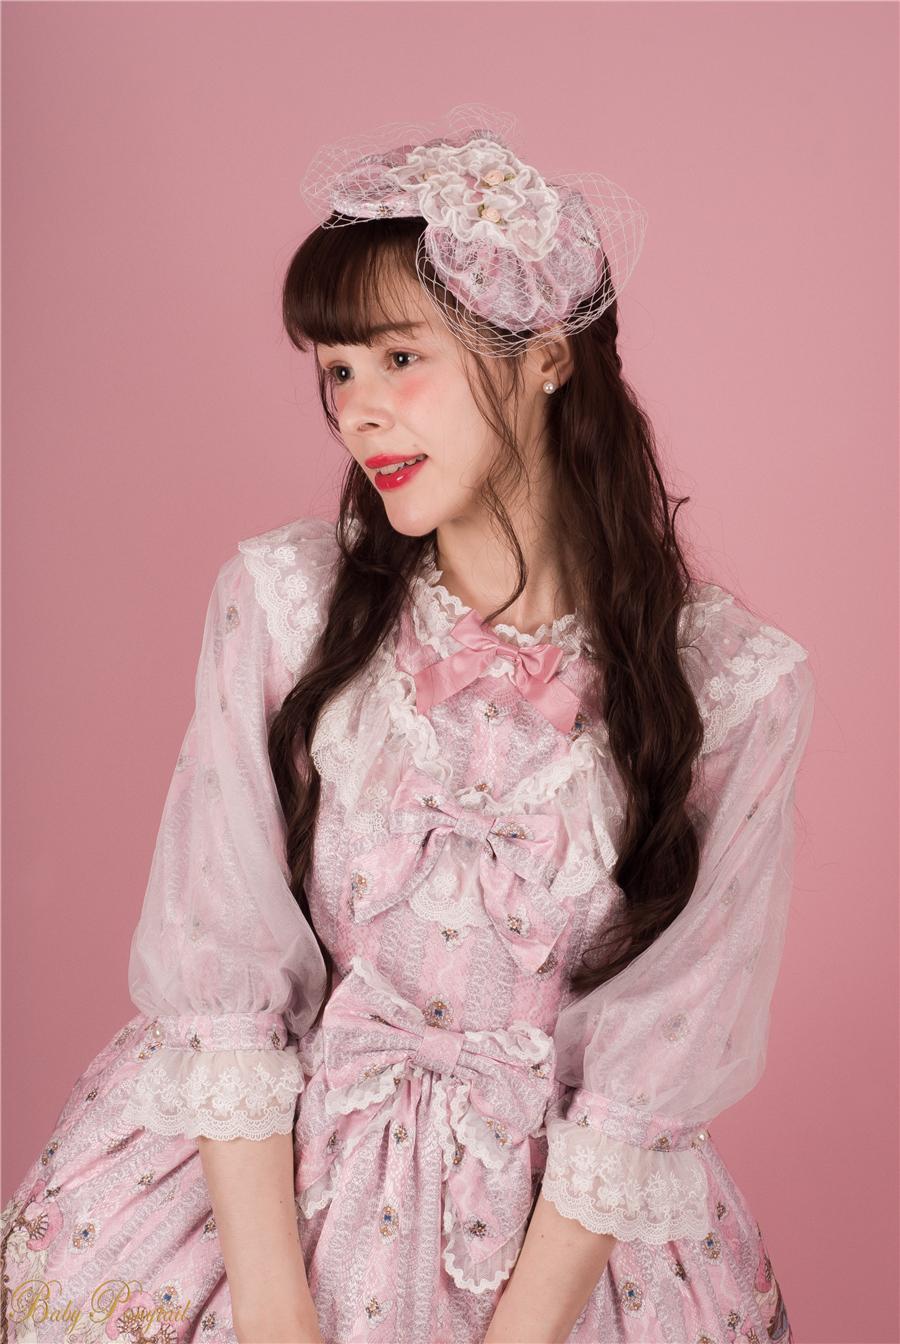 BabyPonytail_Model Photo_My Favorite Companion_OP Pink_5.jpg